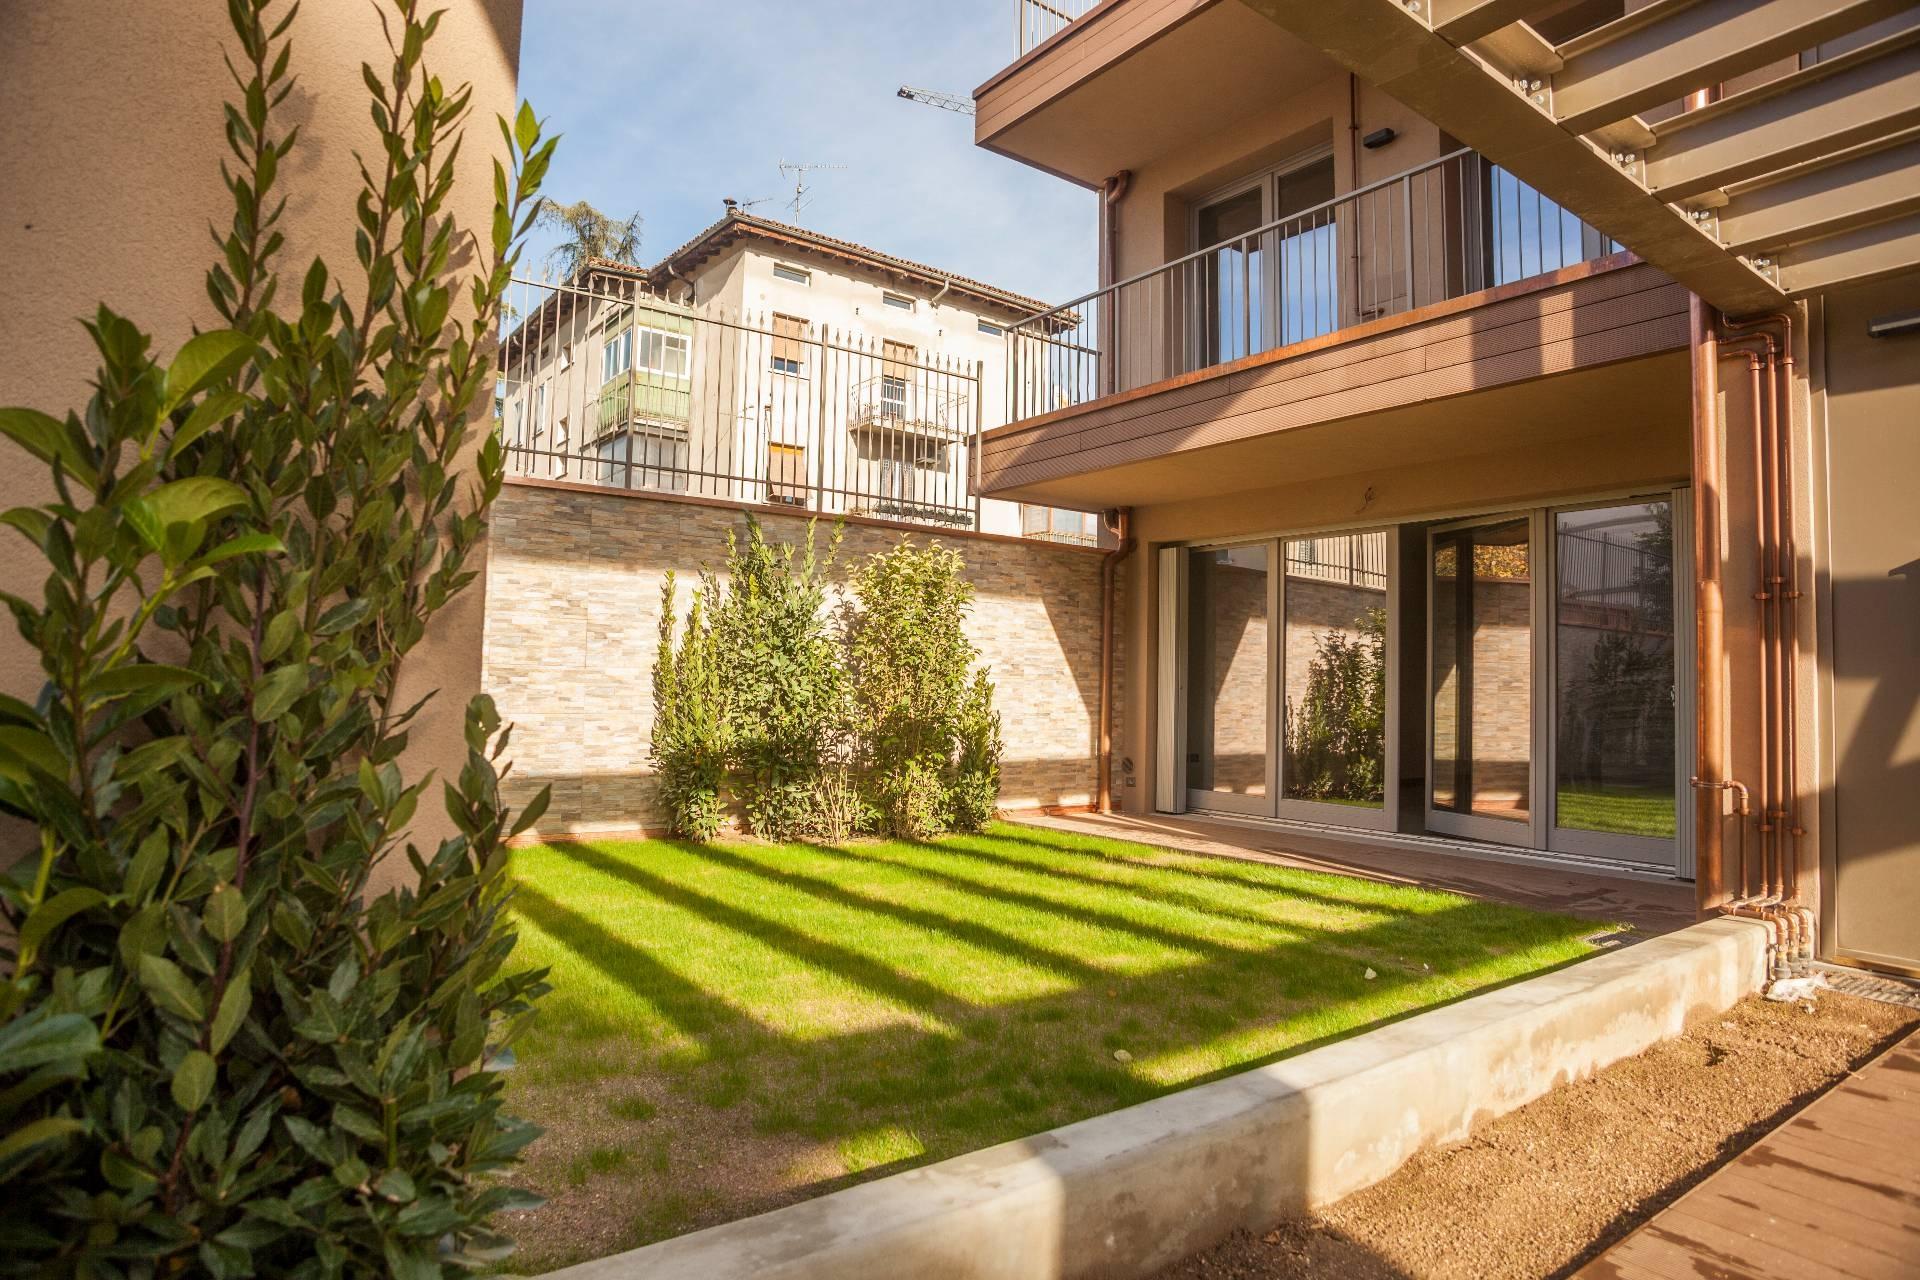 appartamento in vendita a verona via monte ortigara ForAppartamento In Vendita A Verona